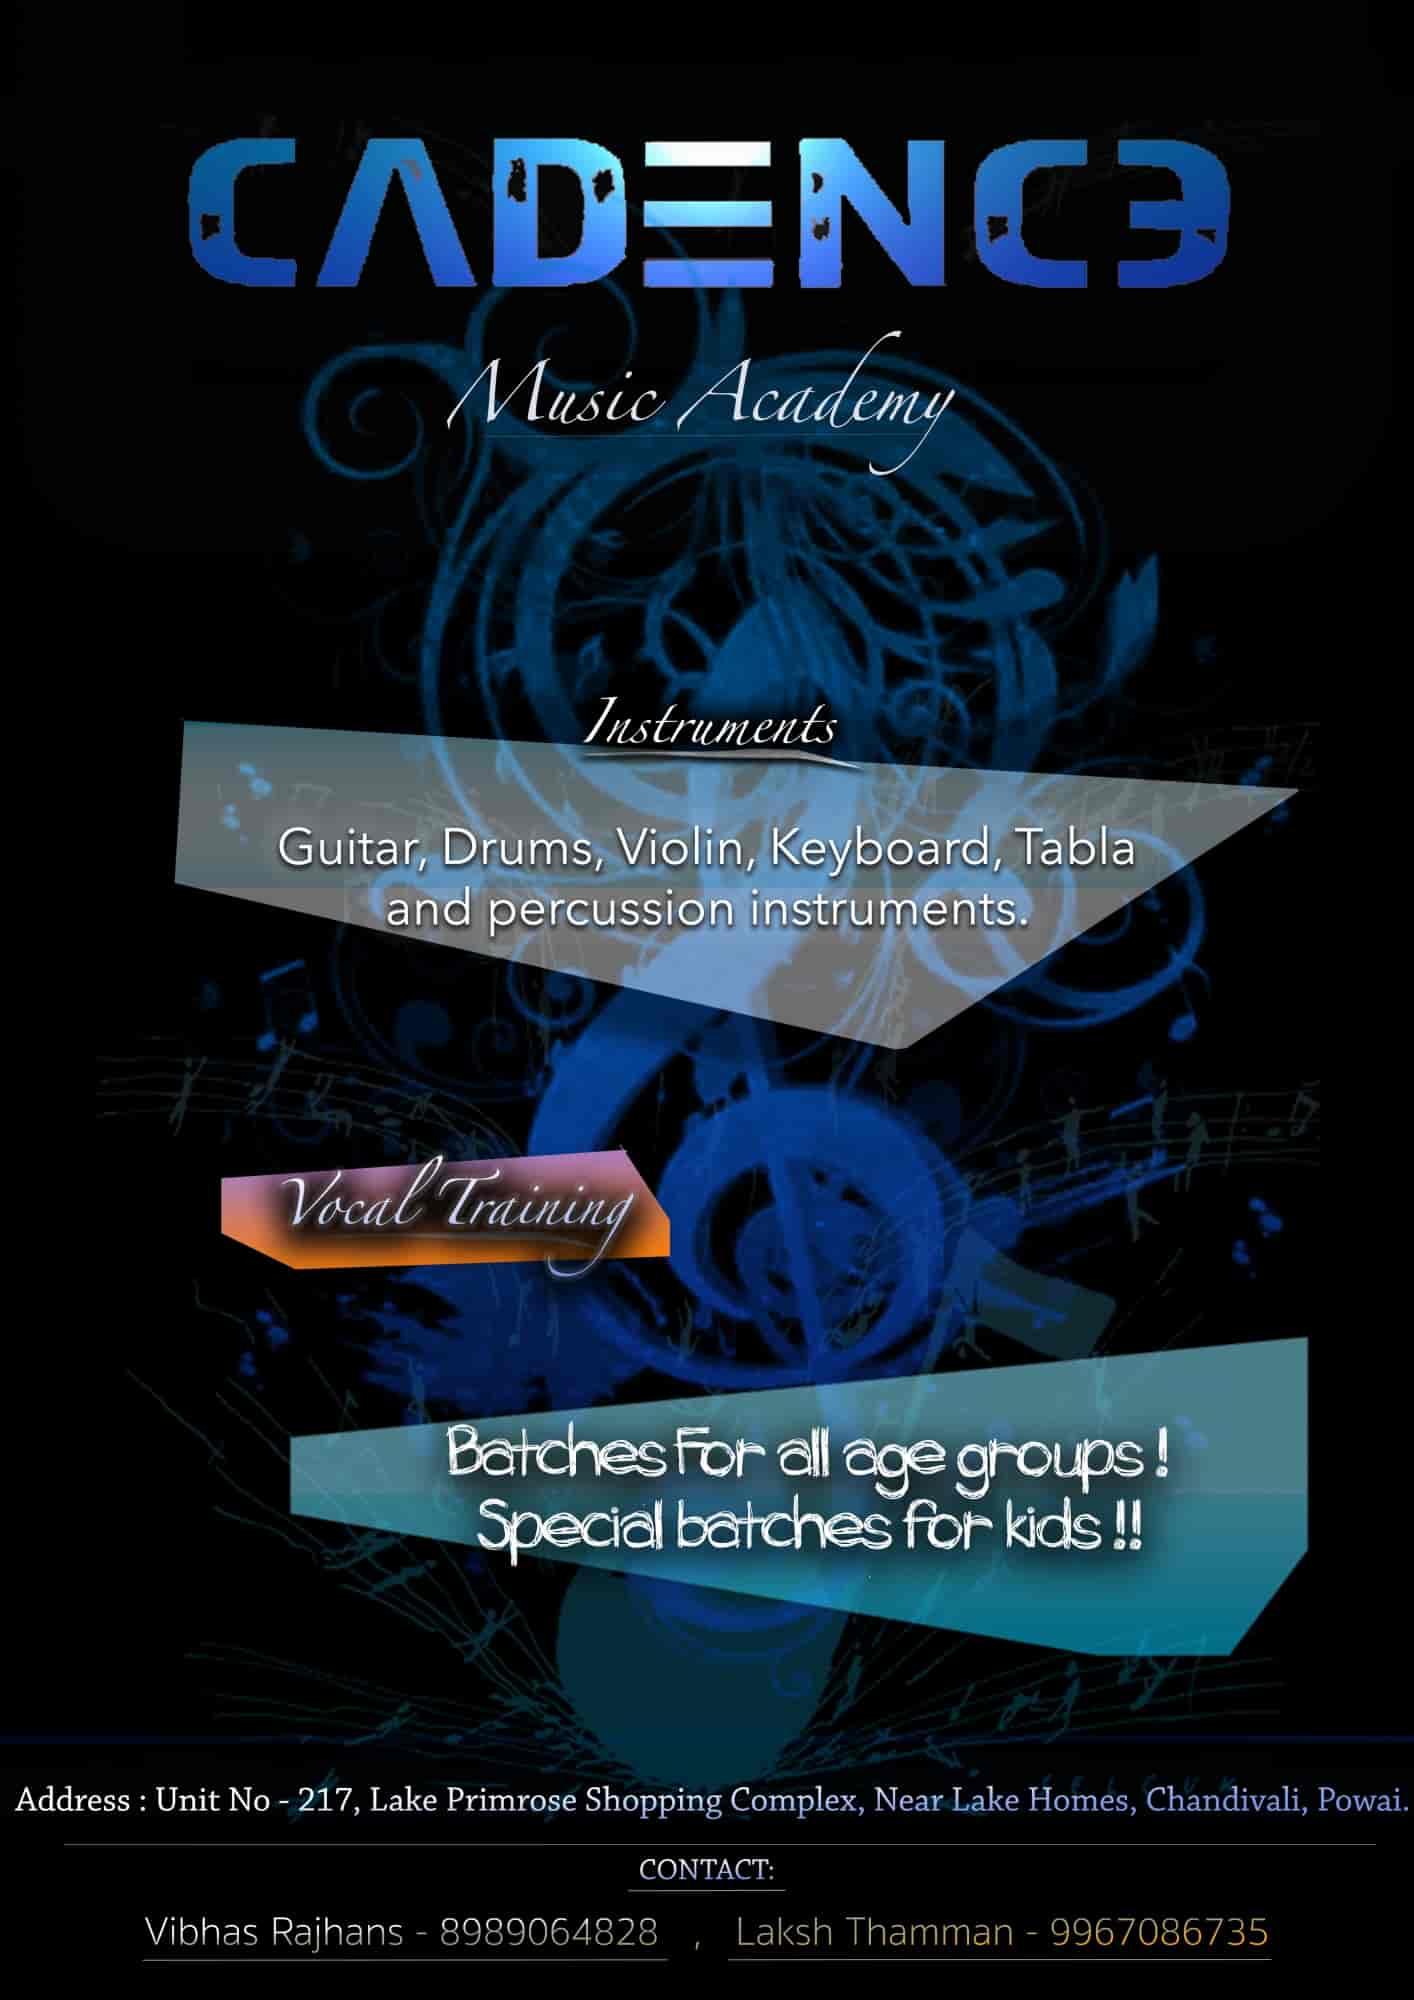 Cadence Music Academy, Powai - Dance Classes in mumbai